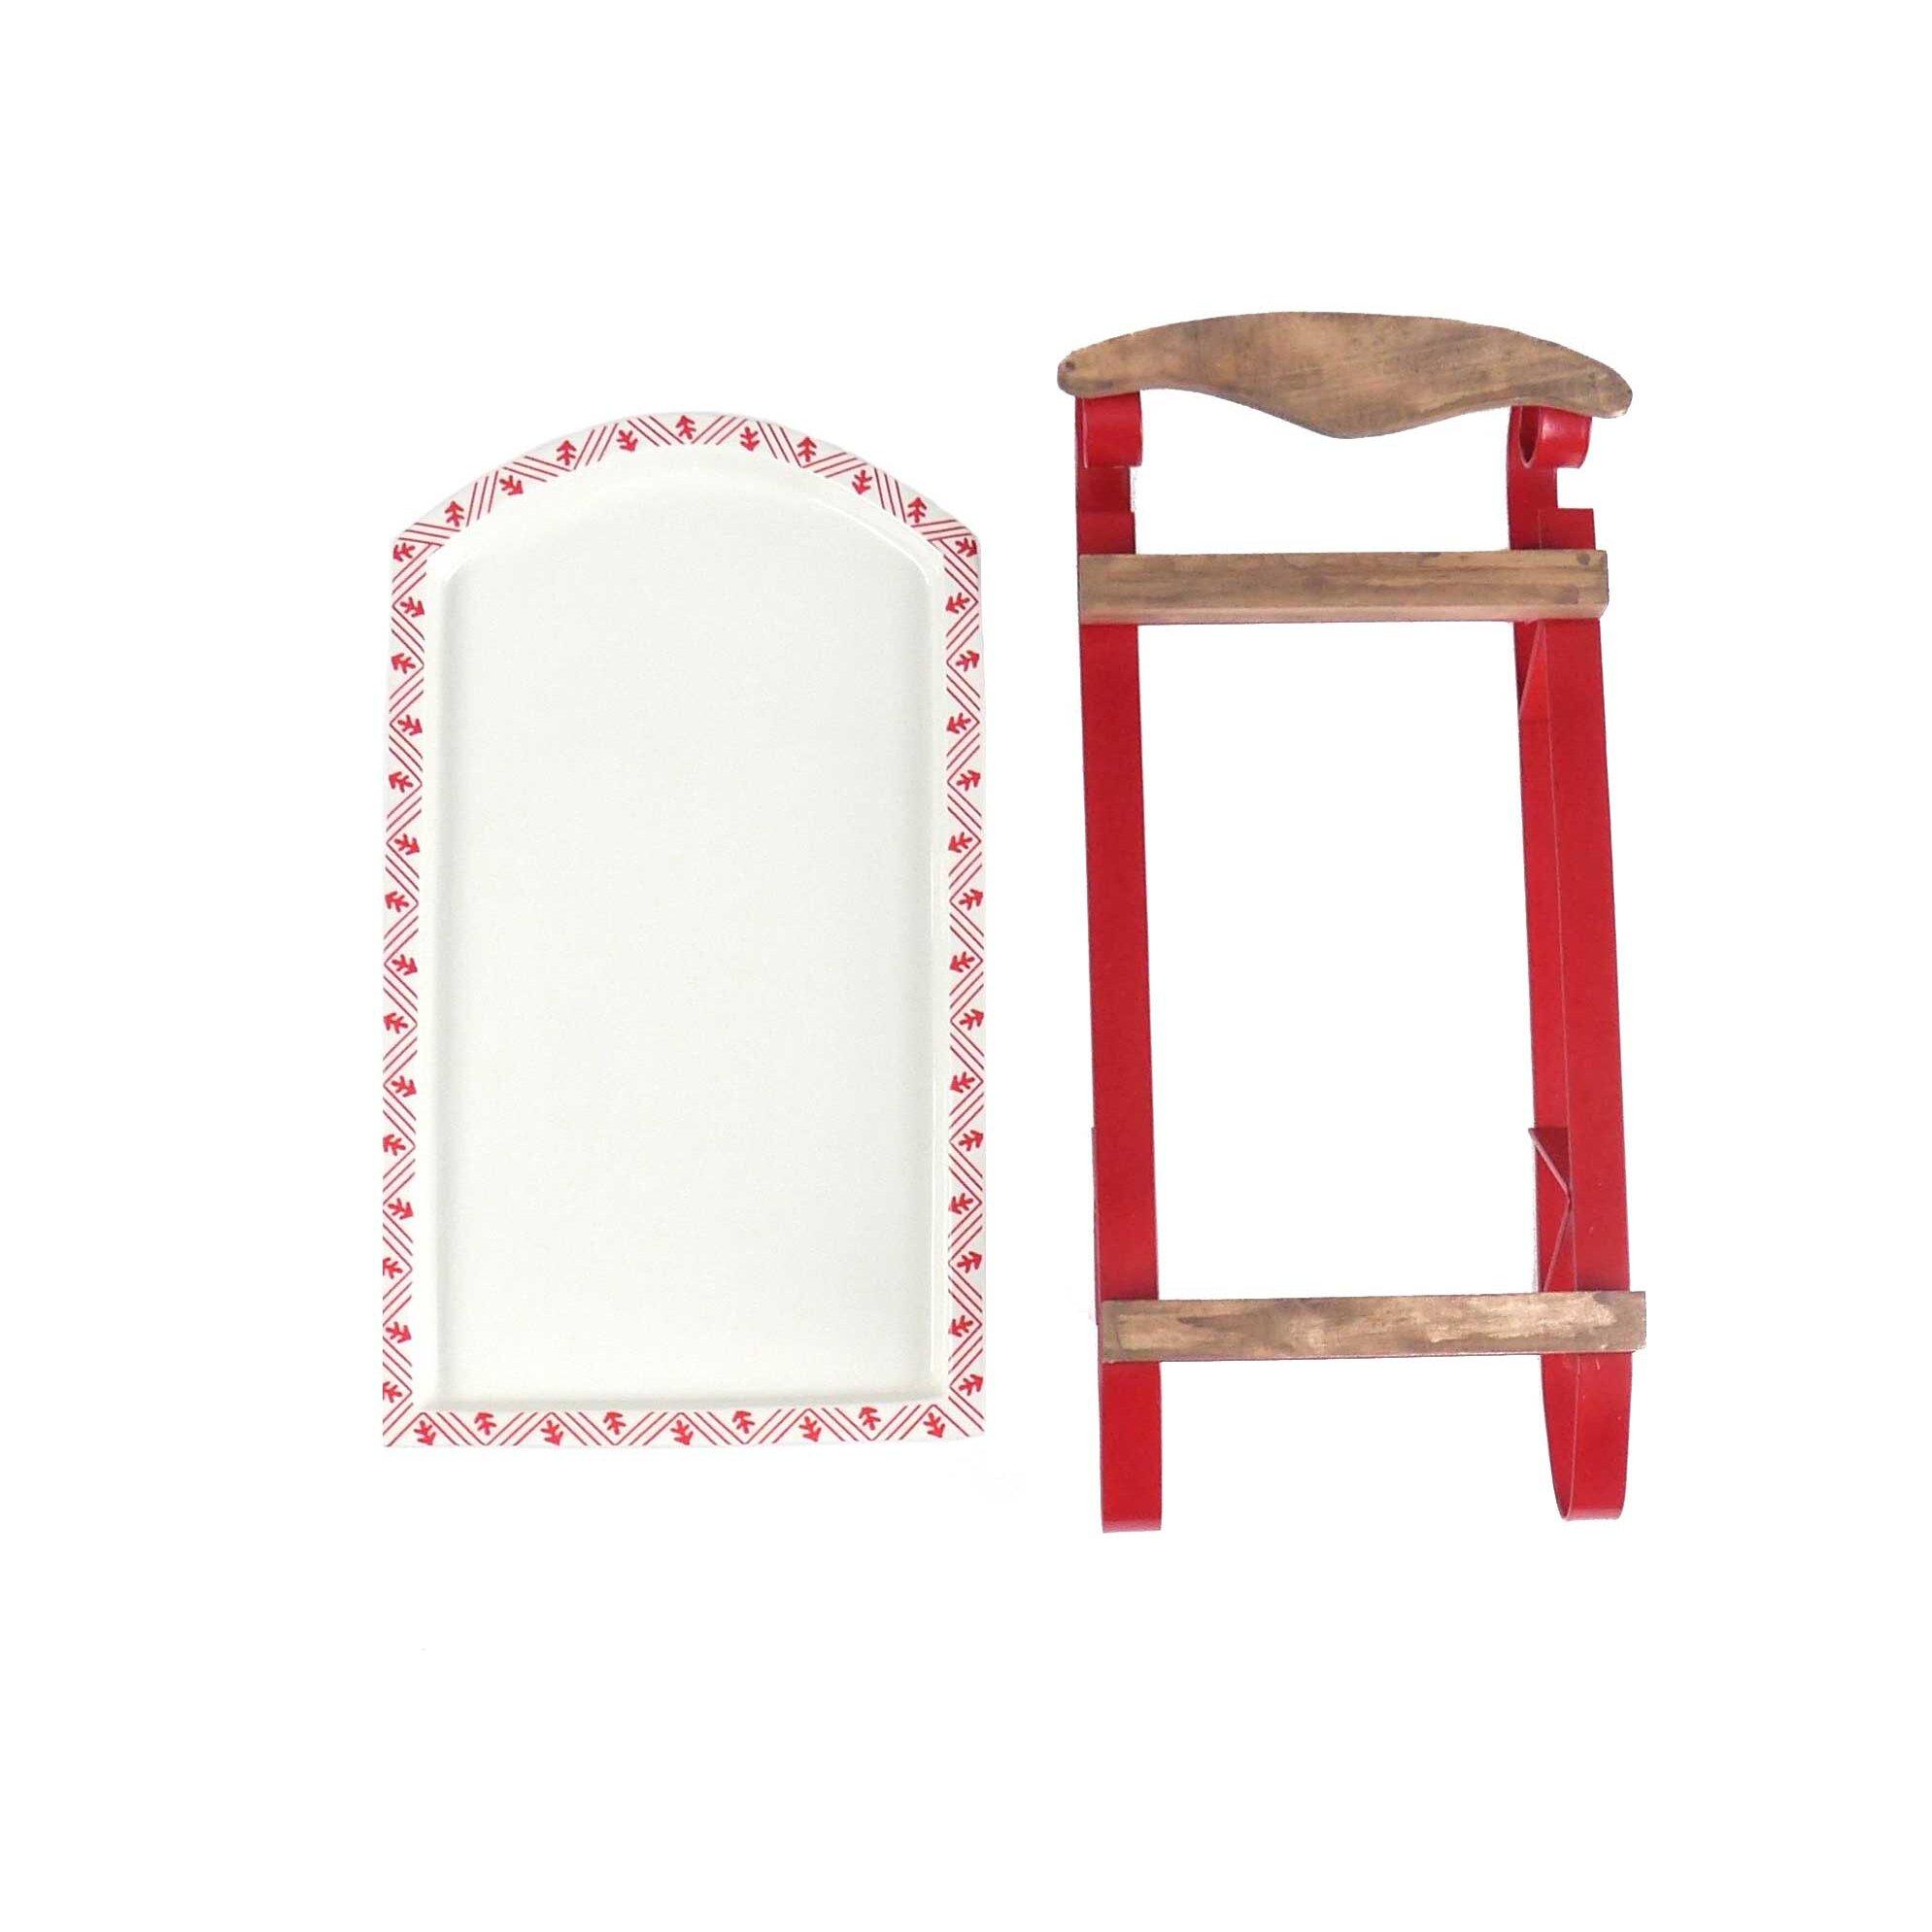 Hallmark Home & Gifts Holiday Serving Sleigh Platter ...